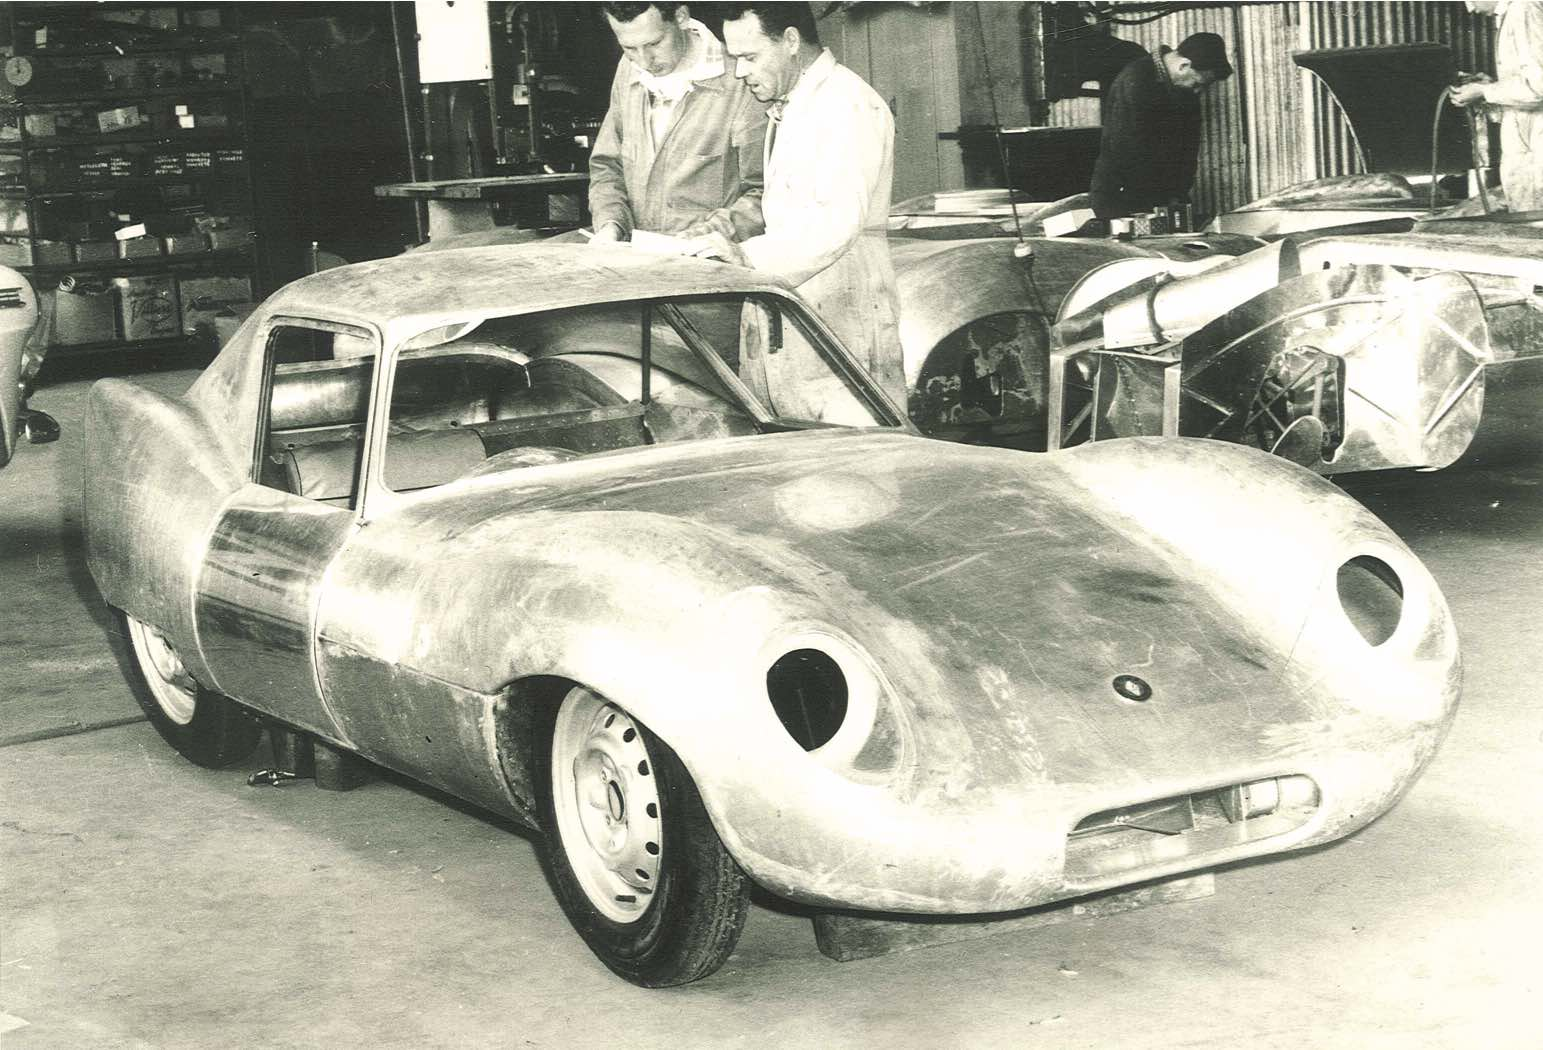 Garrie Cooper and body-maker John Webb inspect progress of the Elfin GTS Coupe